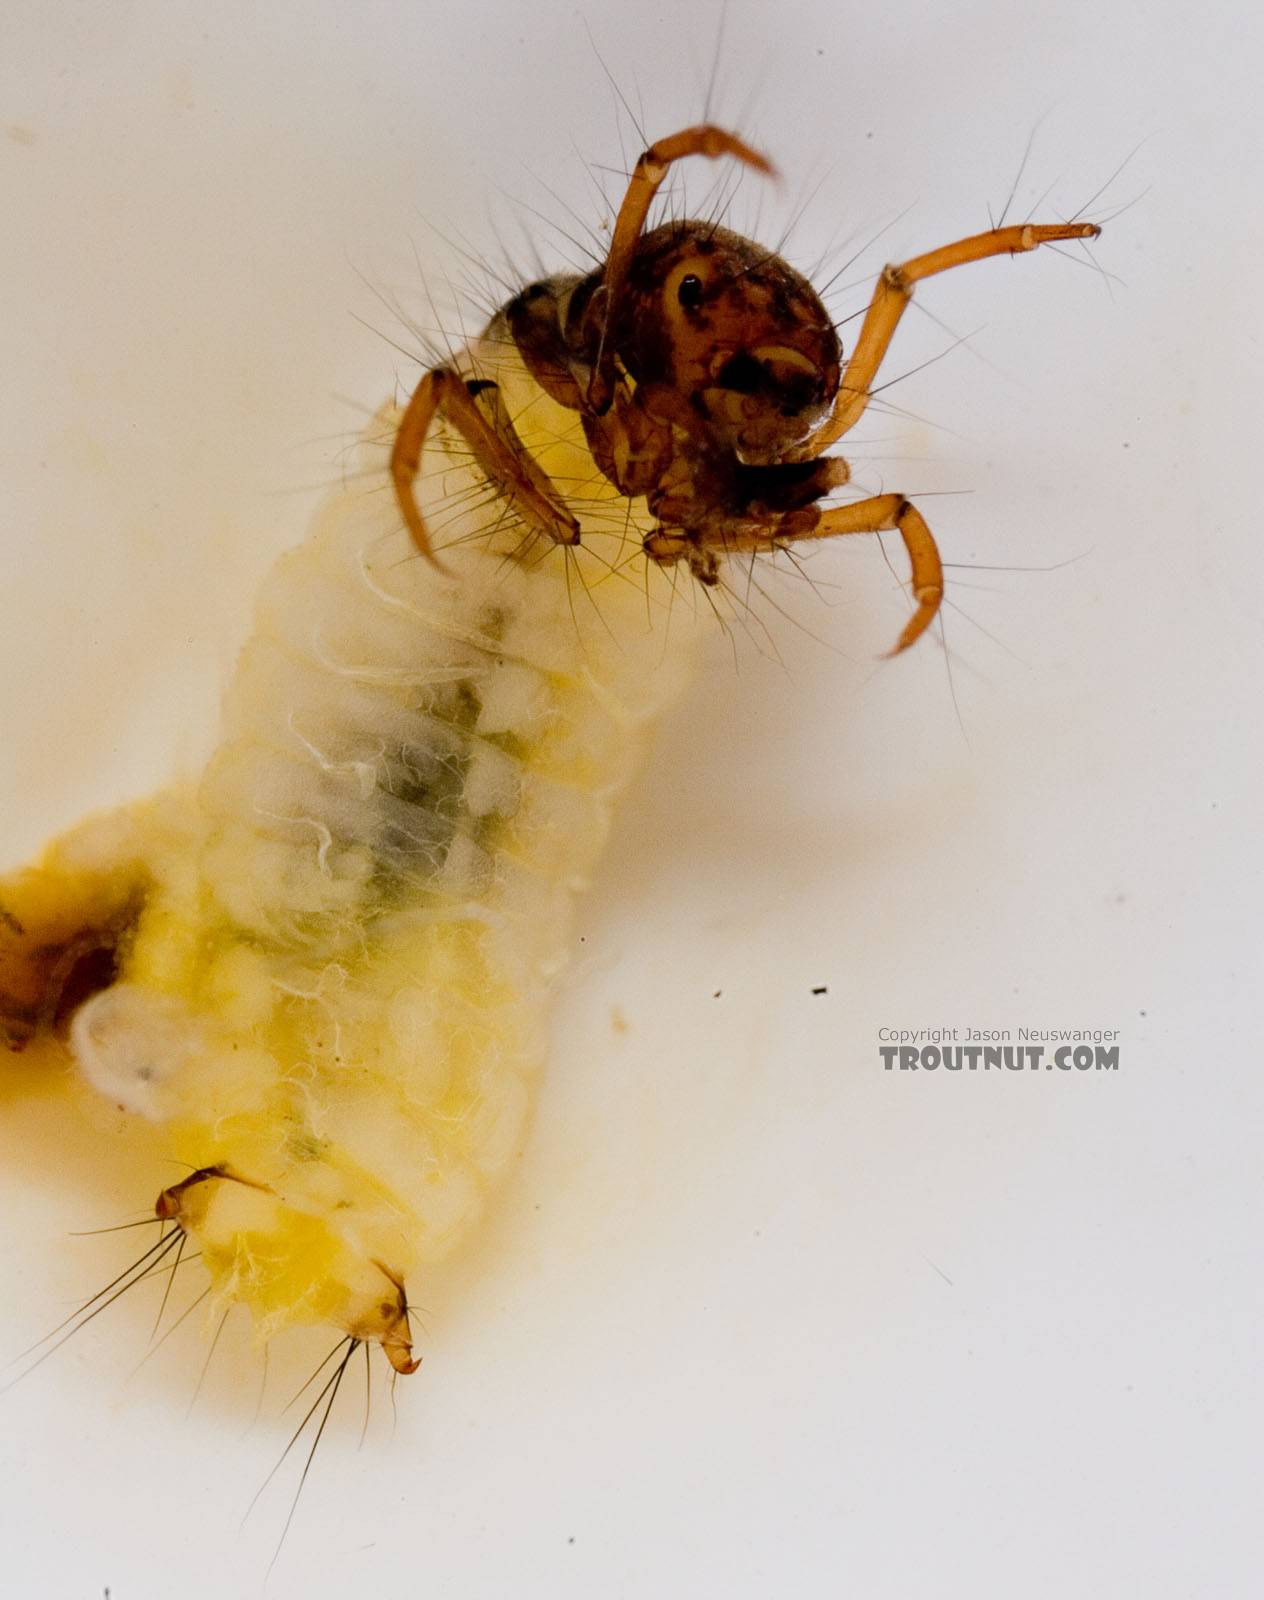 Lepidostoma (Little Brown Sedges) Little Brown Sedge Larva from Mongaup Creek in New York